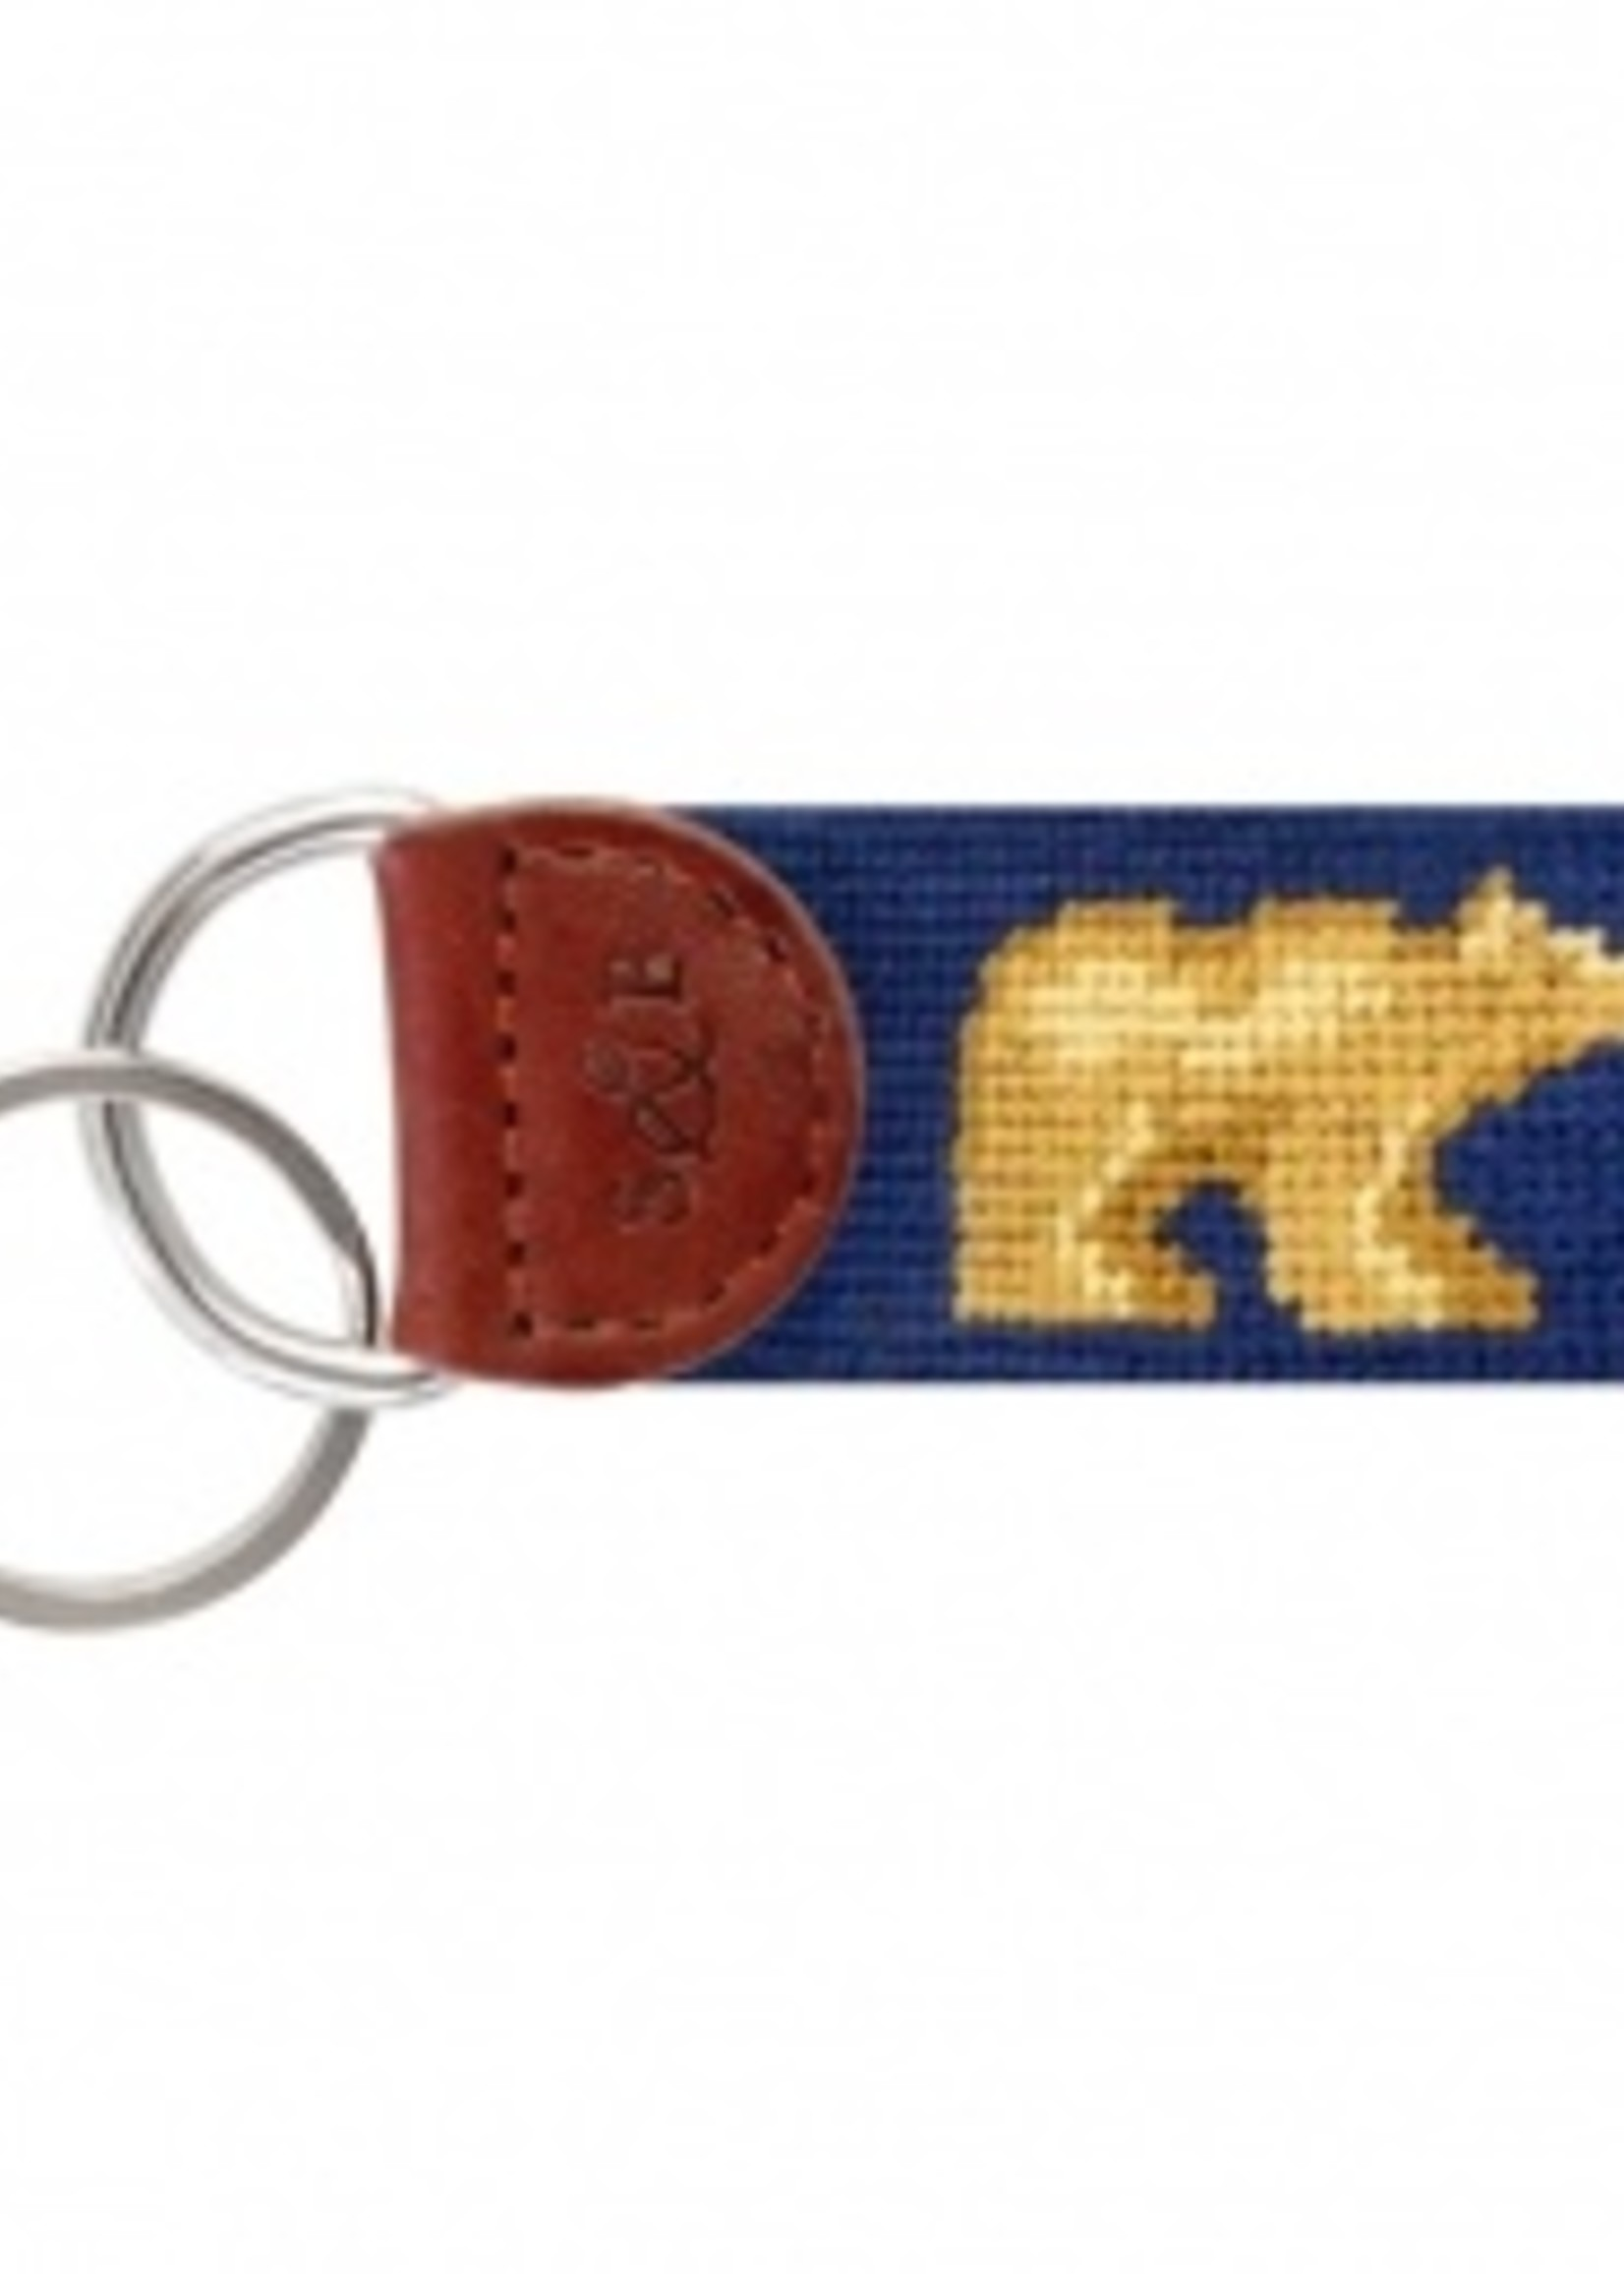 Smathers & Branson Jack Nicklaus Golden Bear Key Fob